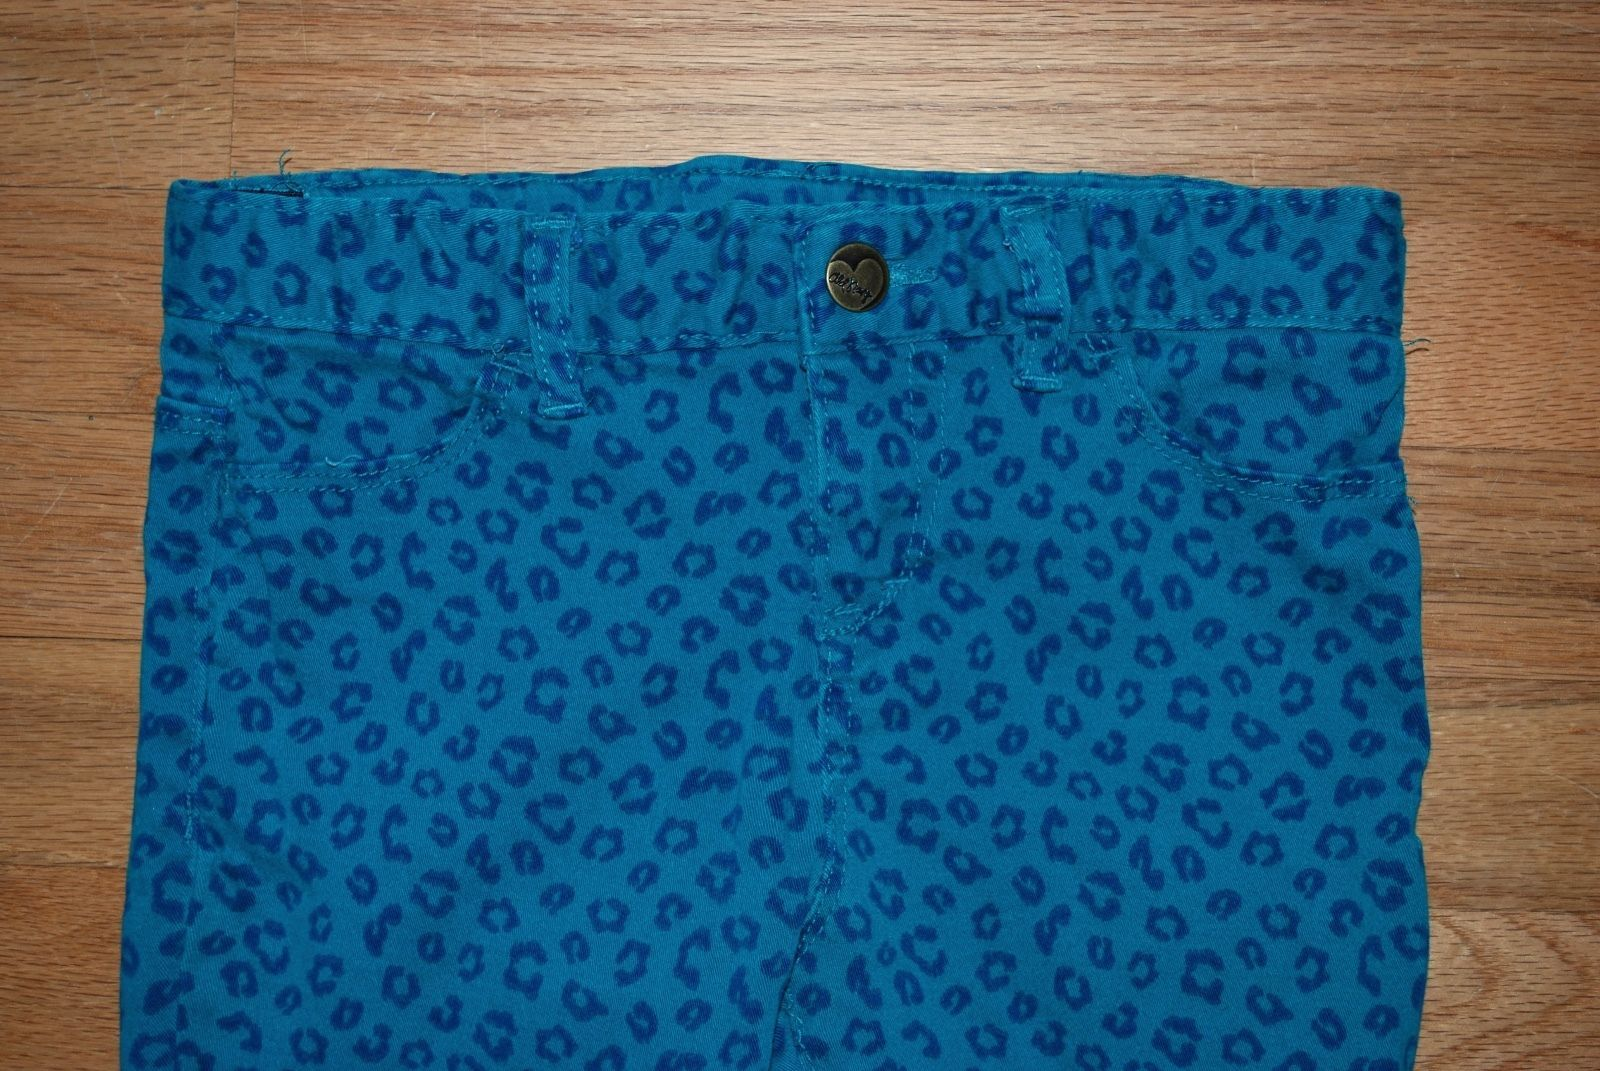 Gap Kids Outfit Set - Jean Jacket ON Leopard Skinny Jeans Jeggings + Justice Top image 6